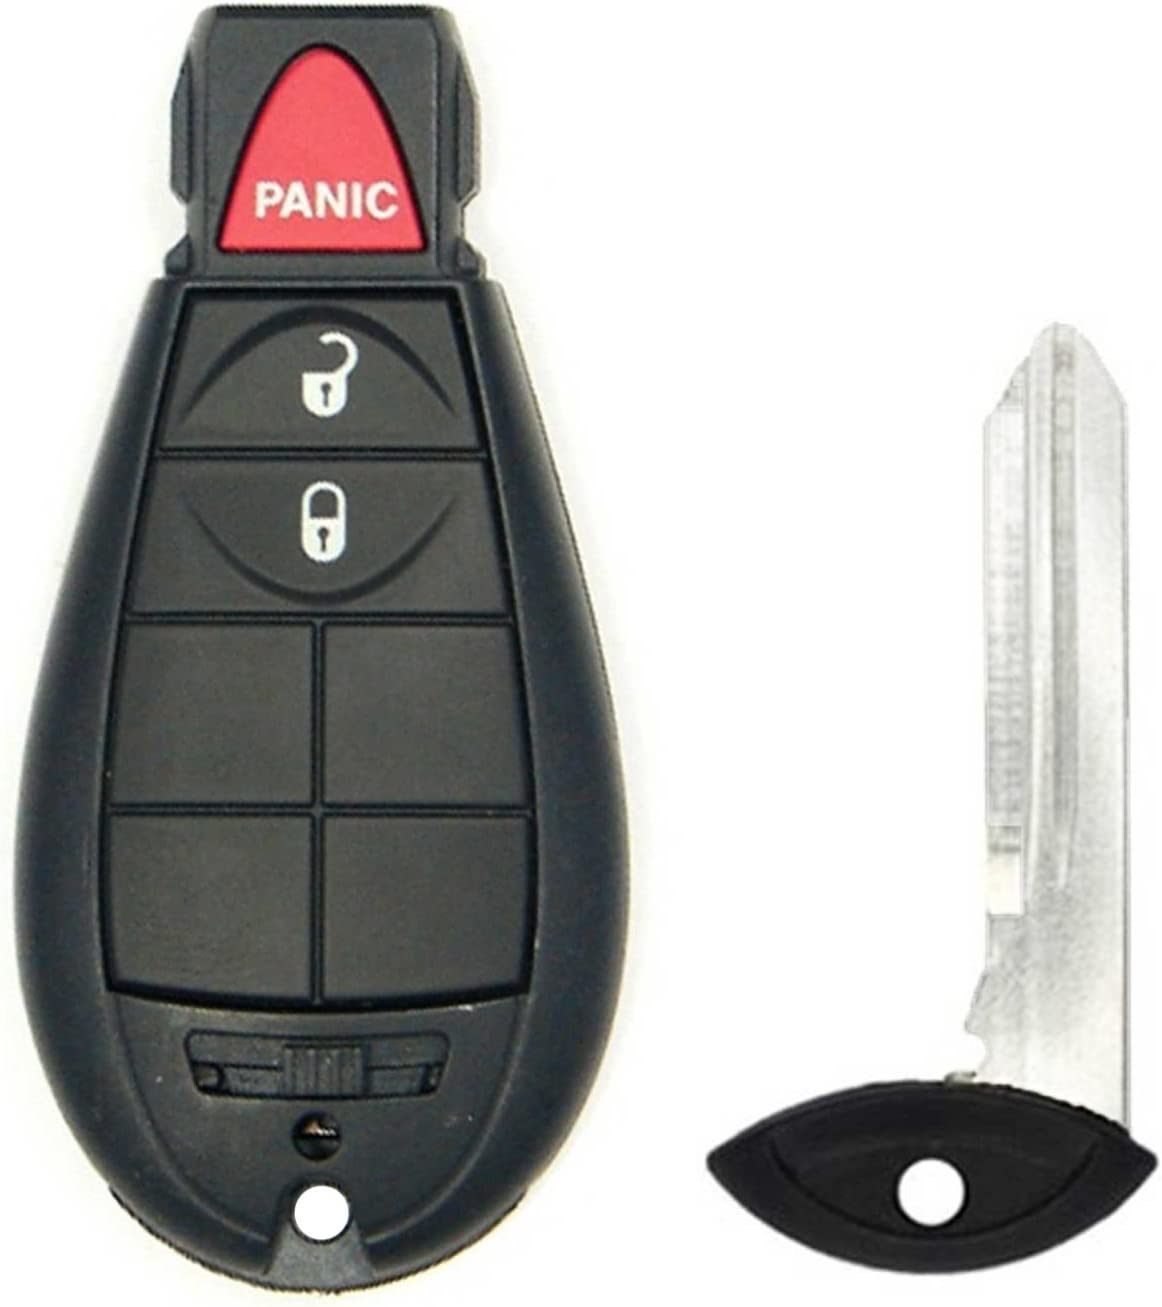 M3N5WY783X, IYZ-C01C fits Chrysler Dodge Jeep Fobik Key Fob Keyless Entry Remote